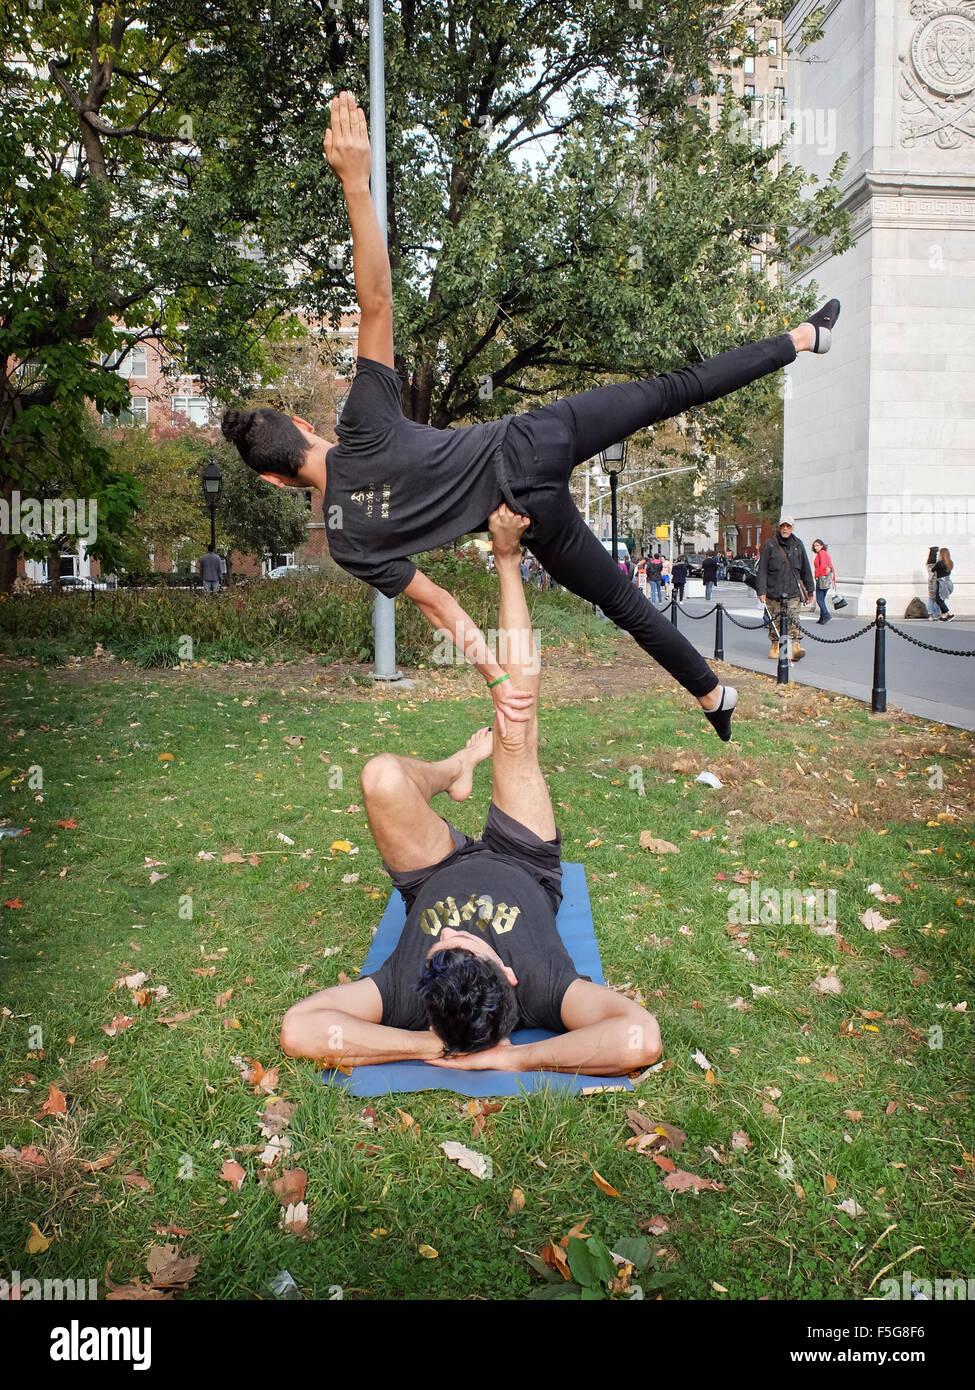 Acro Yoga Stock Photos & Acro Yoga Stock Images - Alamy